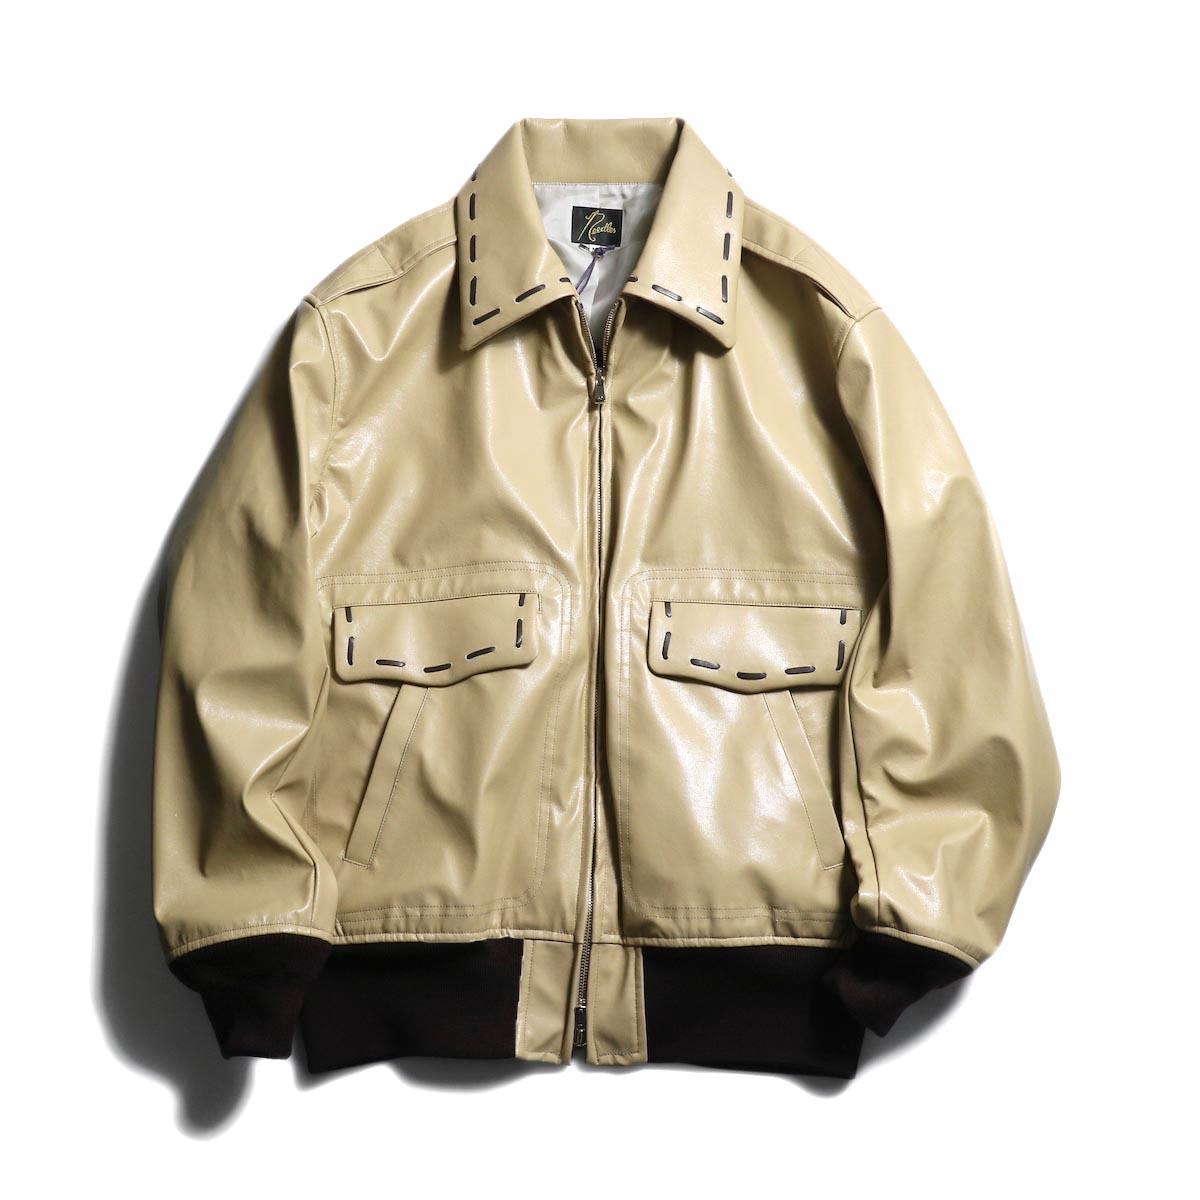 NEEDLES / G-1 Jacket -Synthetic Leather